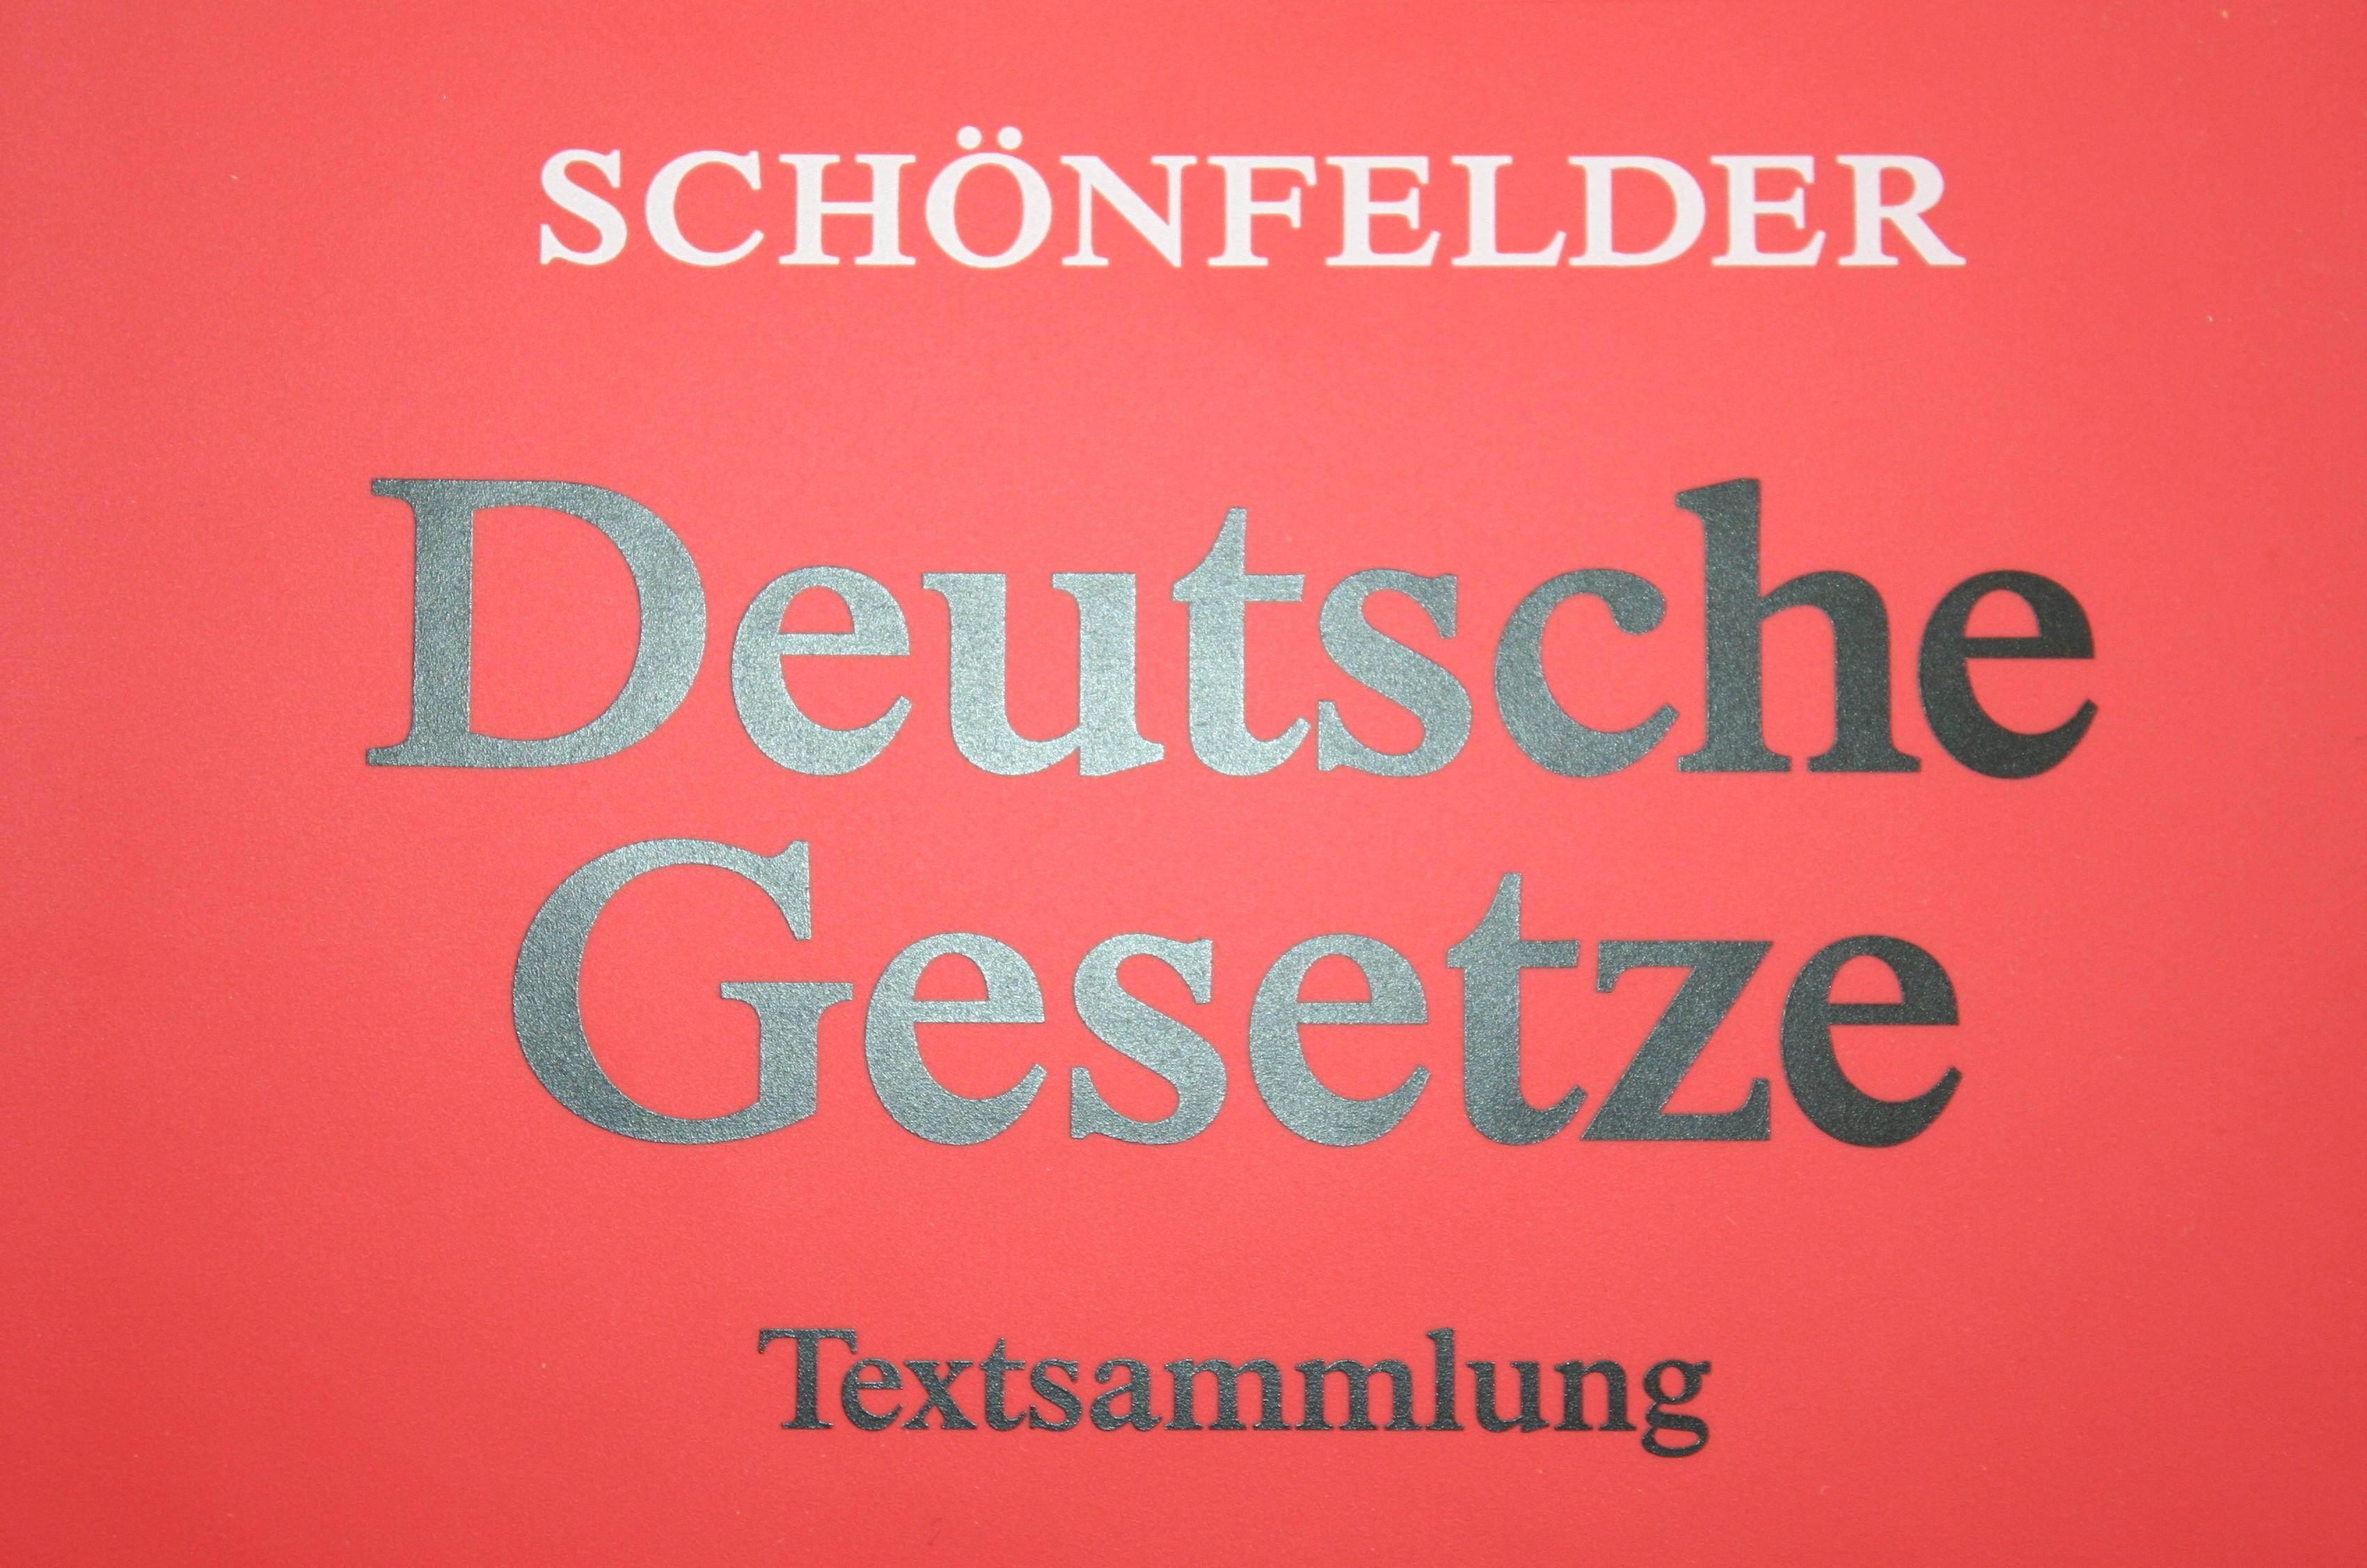 Sch�nfelder Deutsche Gesetze Bild WG